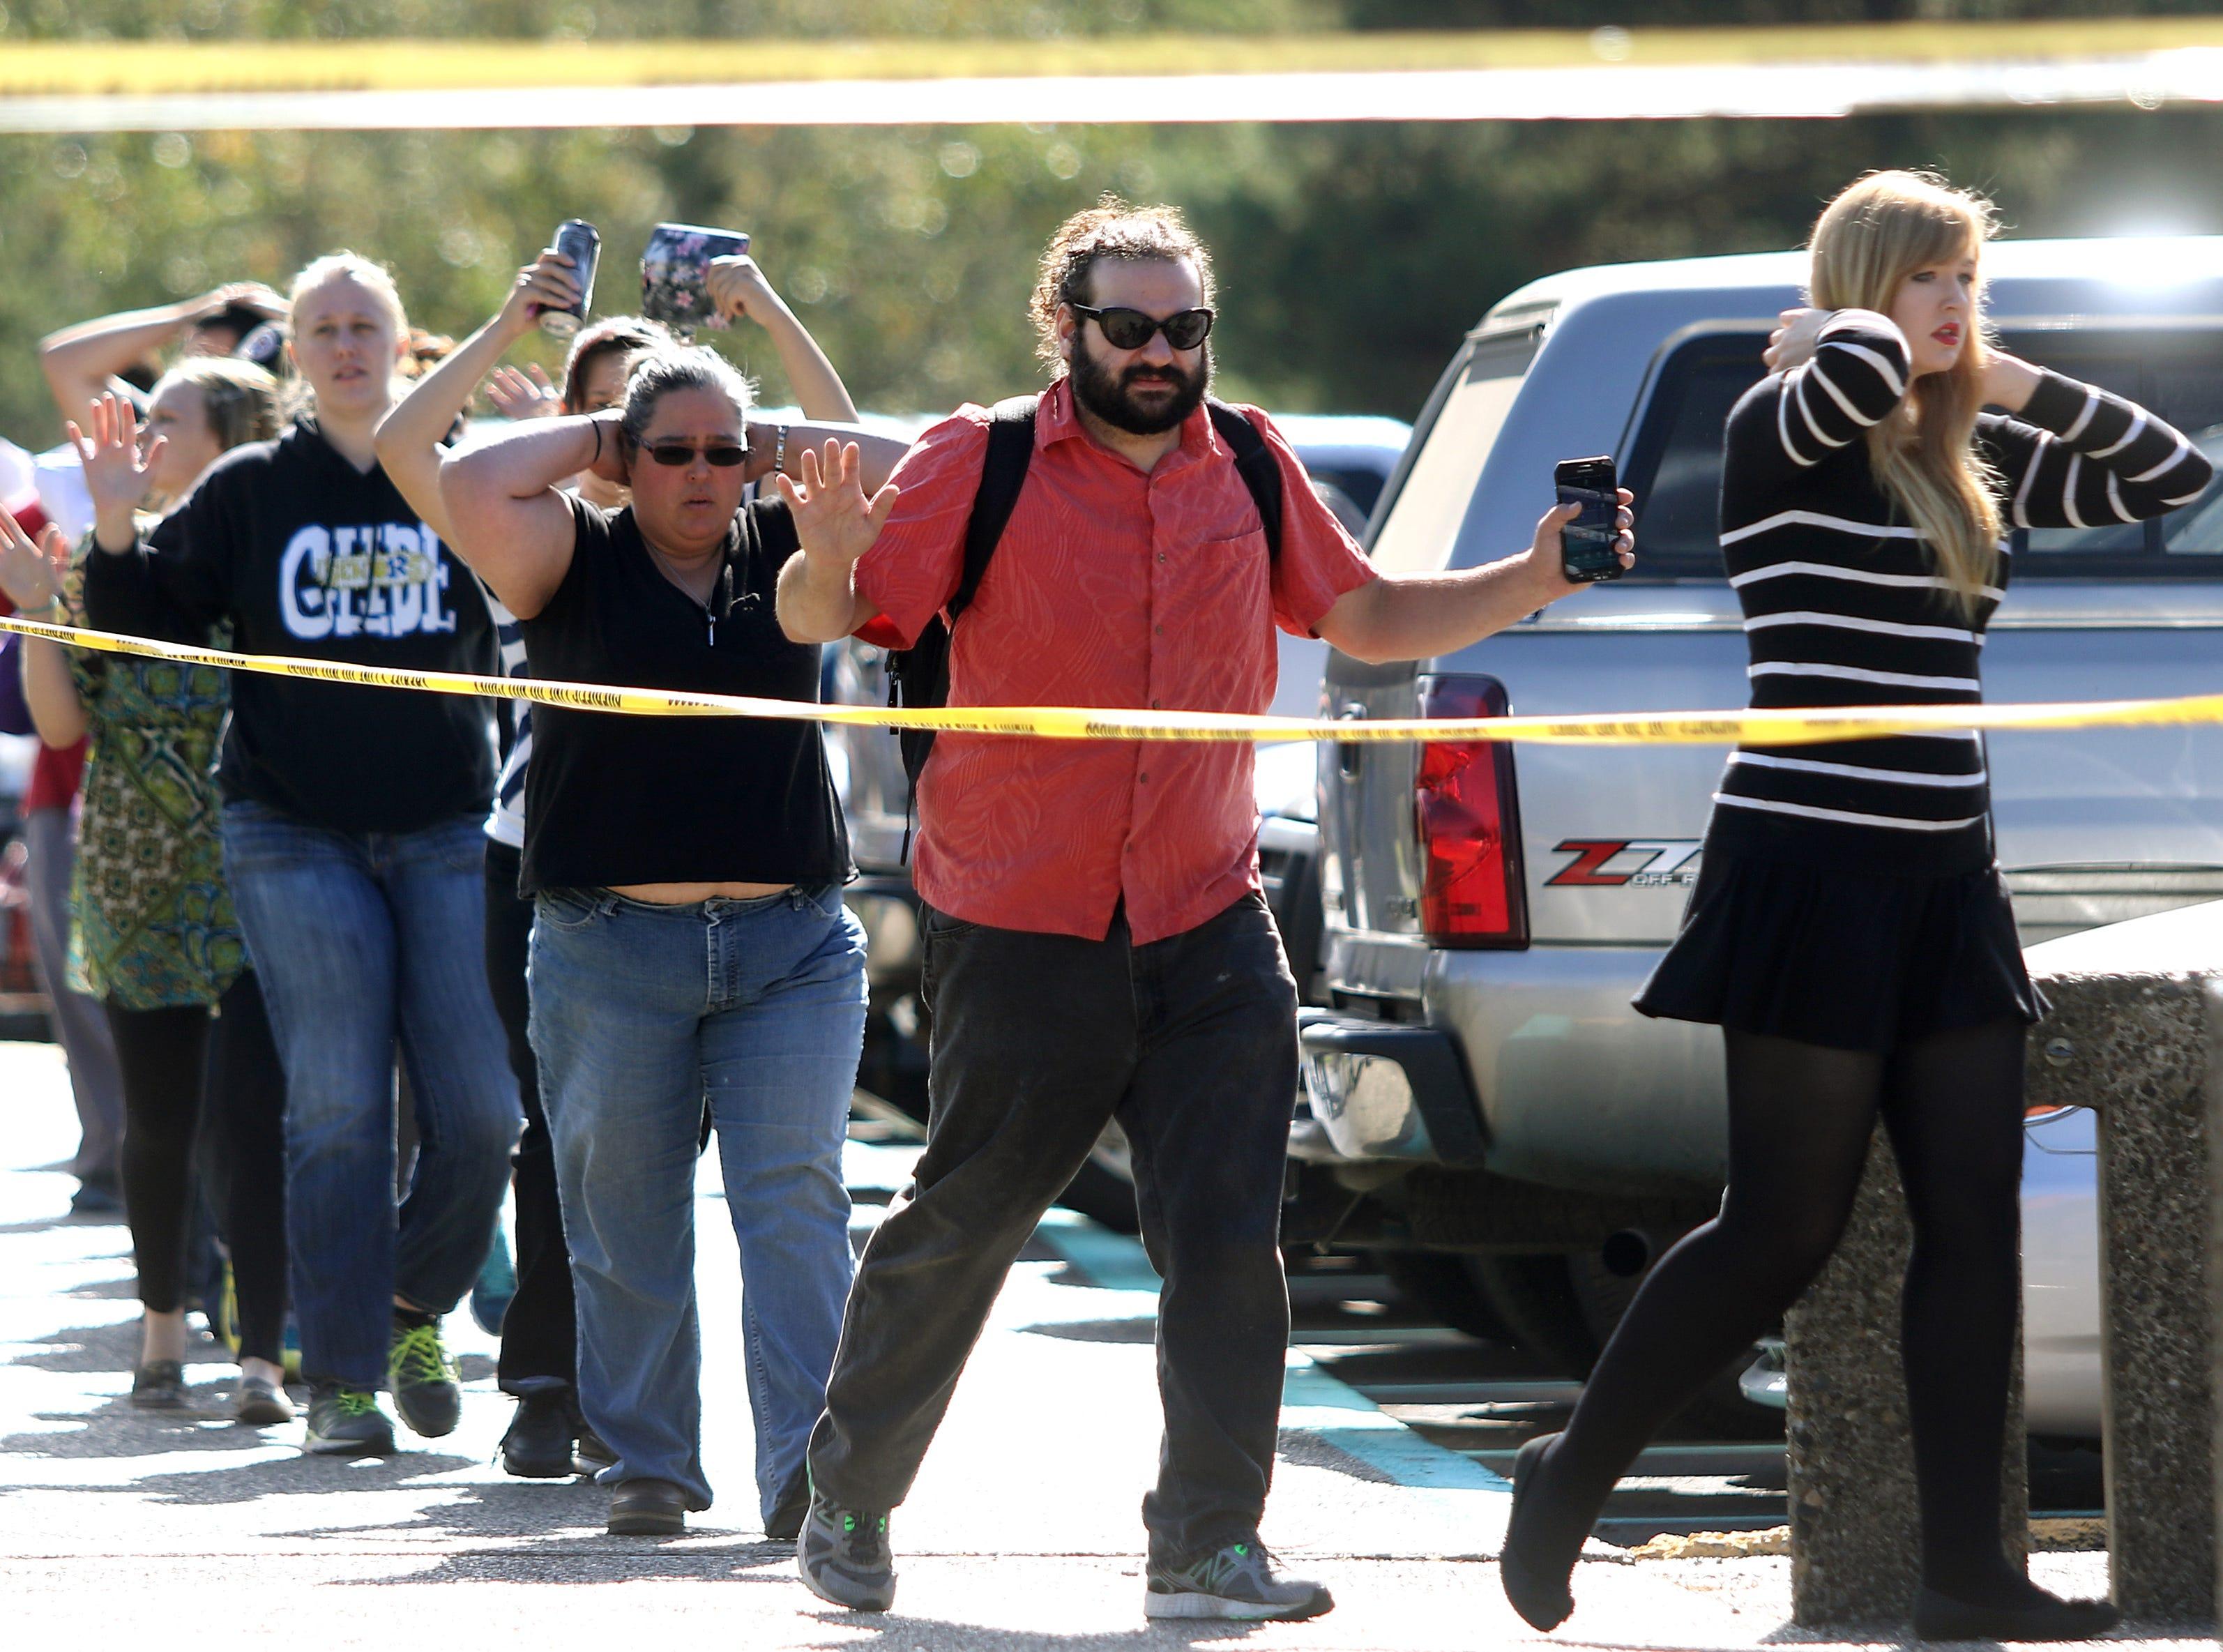 Umpqua Community College   Roseburg, Oregon   Oct. 1, 2015   10 dead   8 wounded